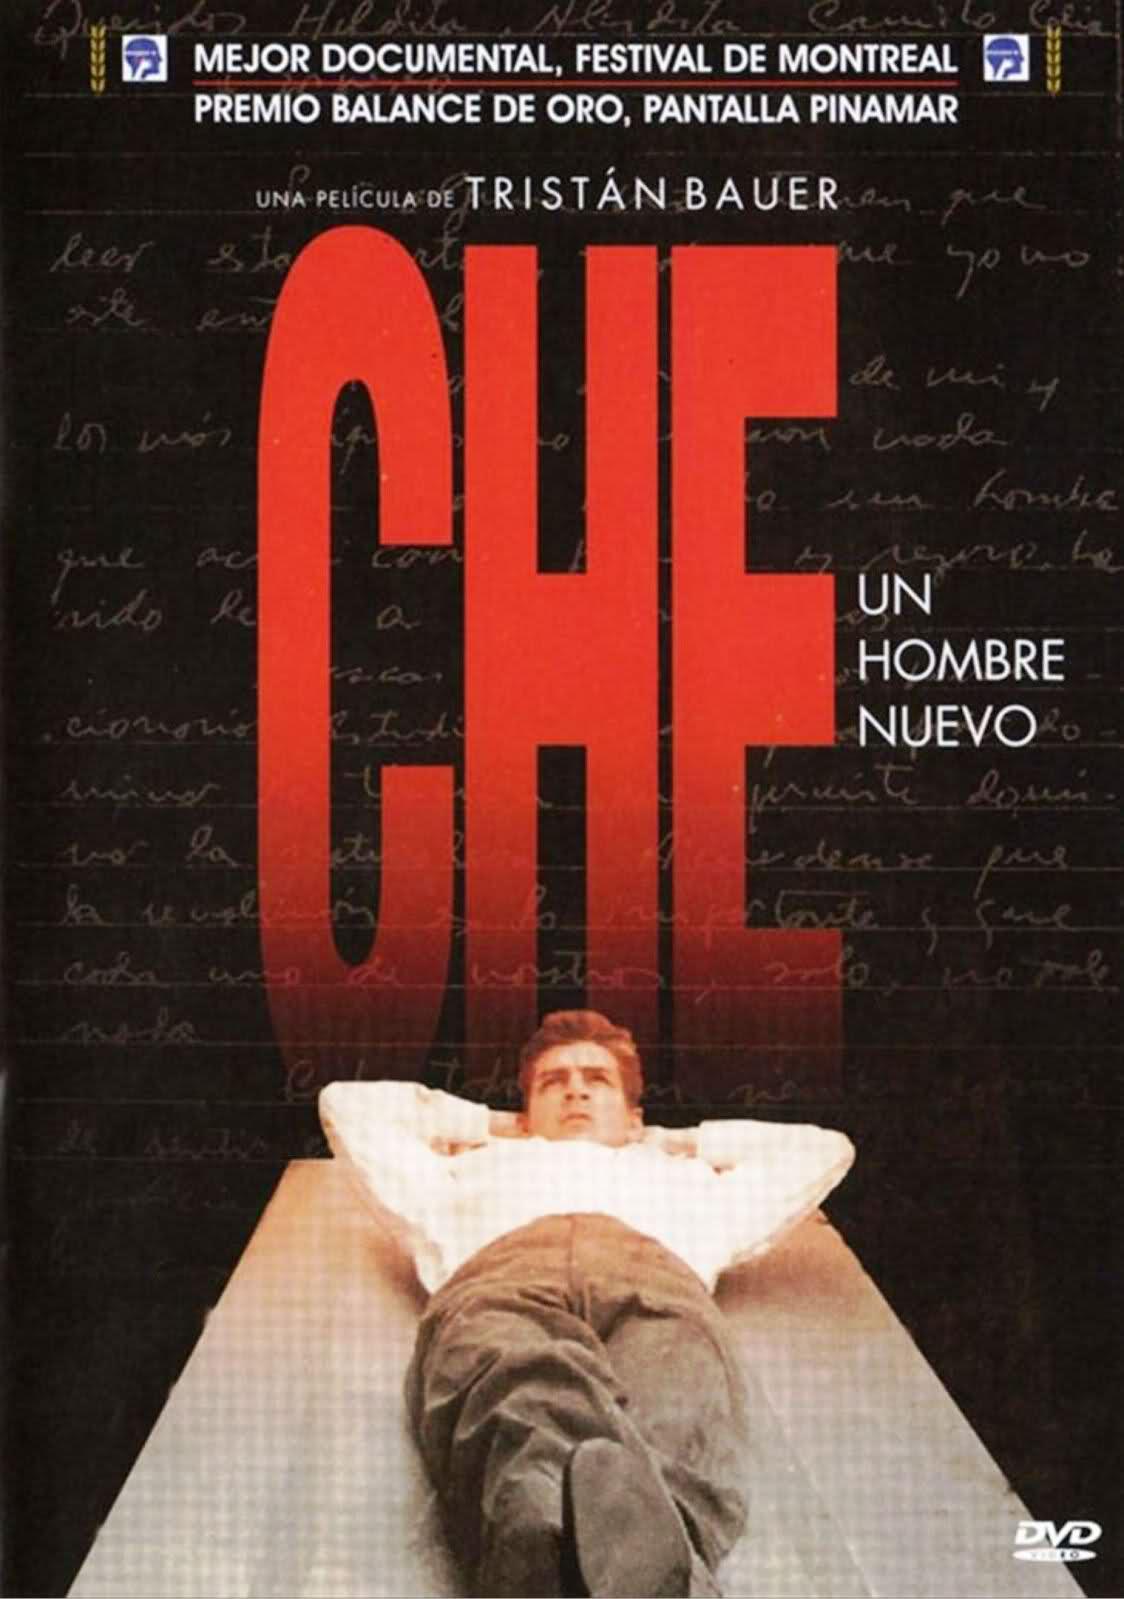 df305dfe5 Che. Un hombre nuevo (2010) - IMDb